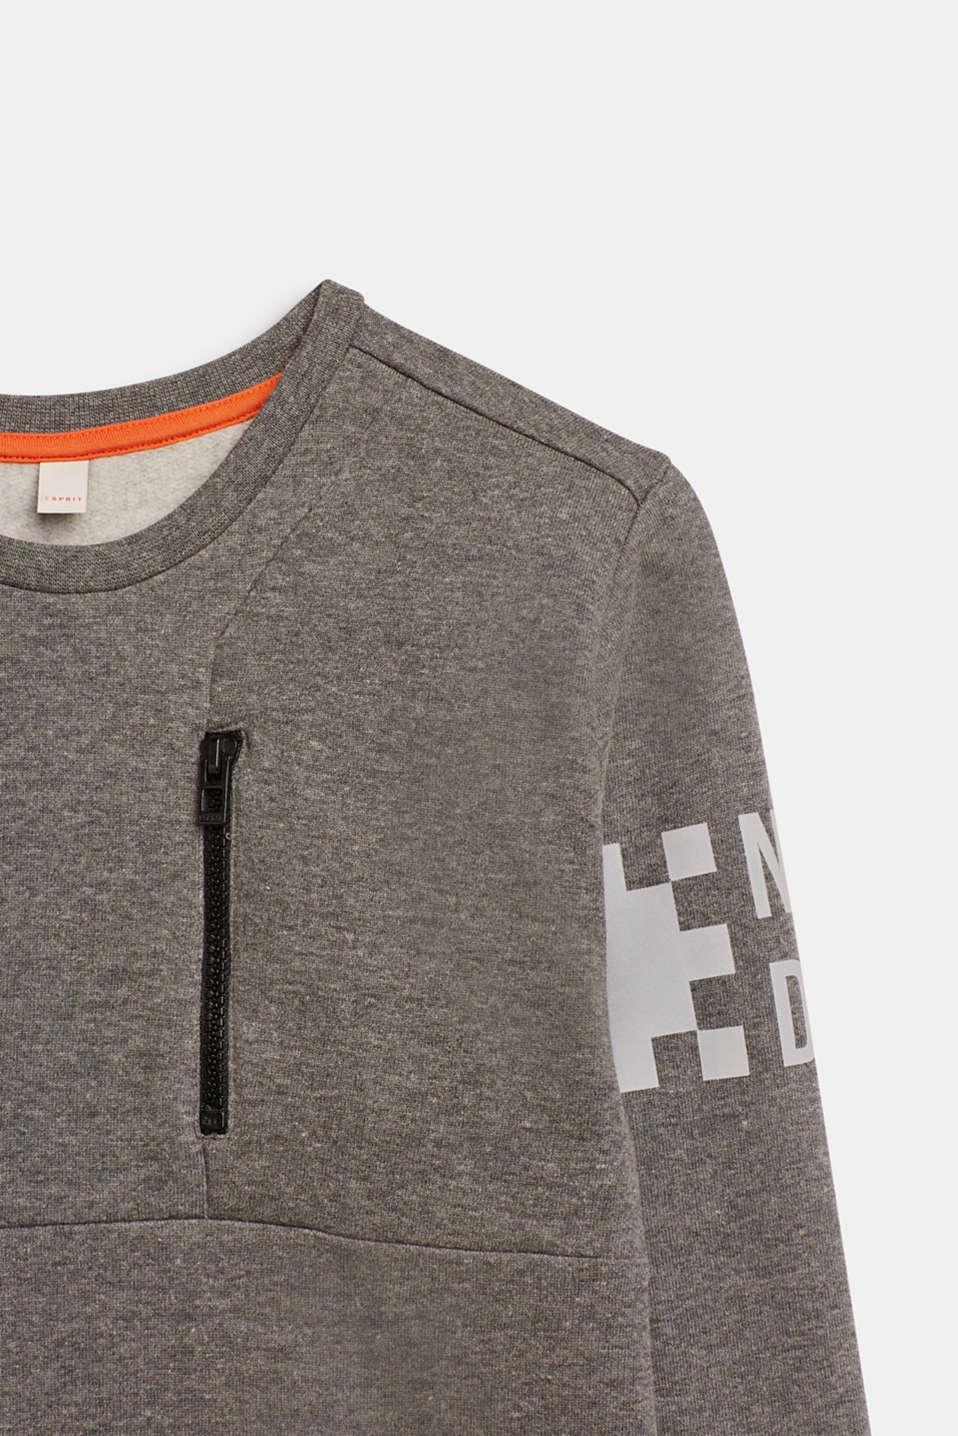 Sweatshirt with print and a zip detail, LCDARK HEATHER G, detail image number 2